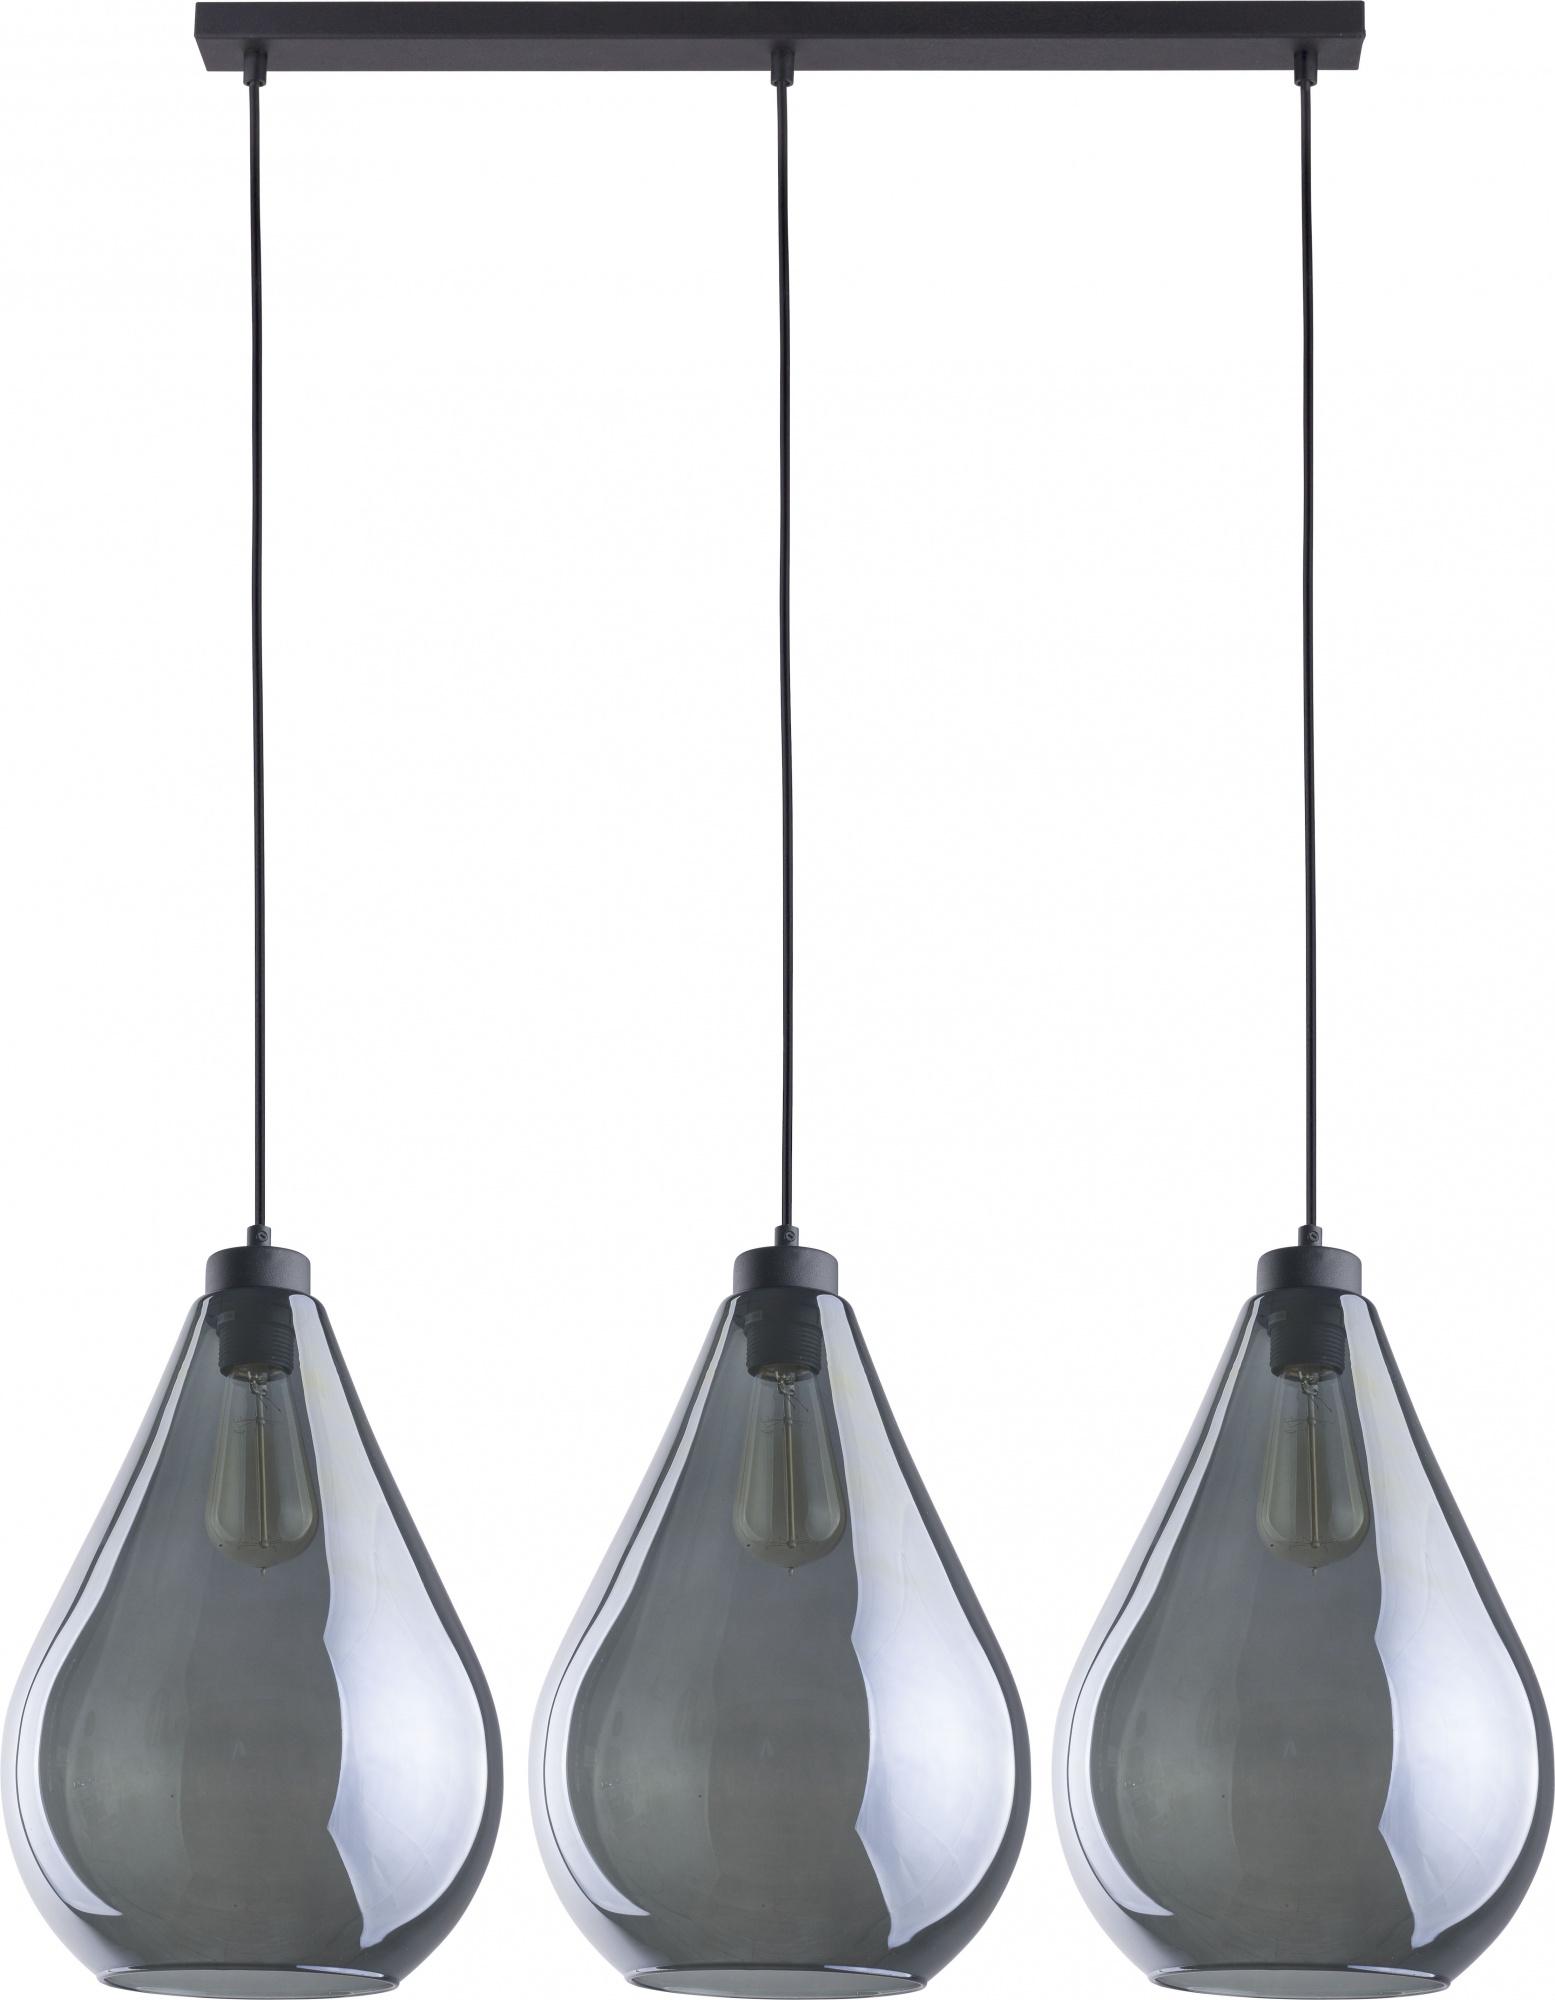 TK Lighting TK-2792 Fuente függeszték